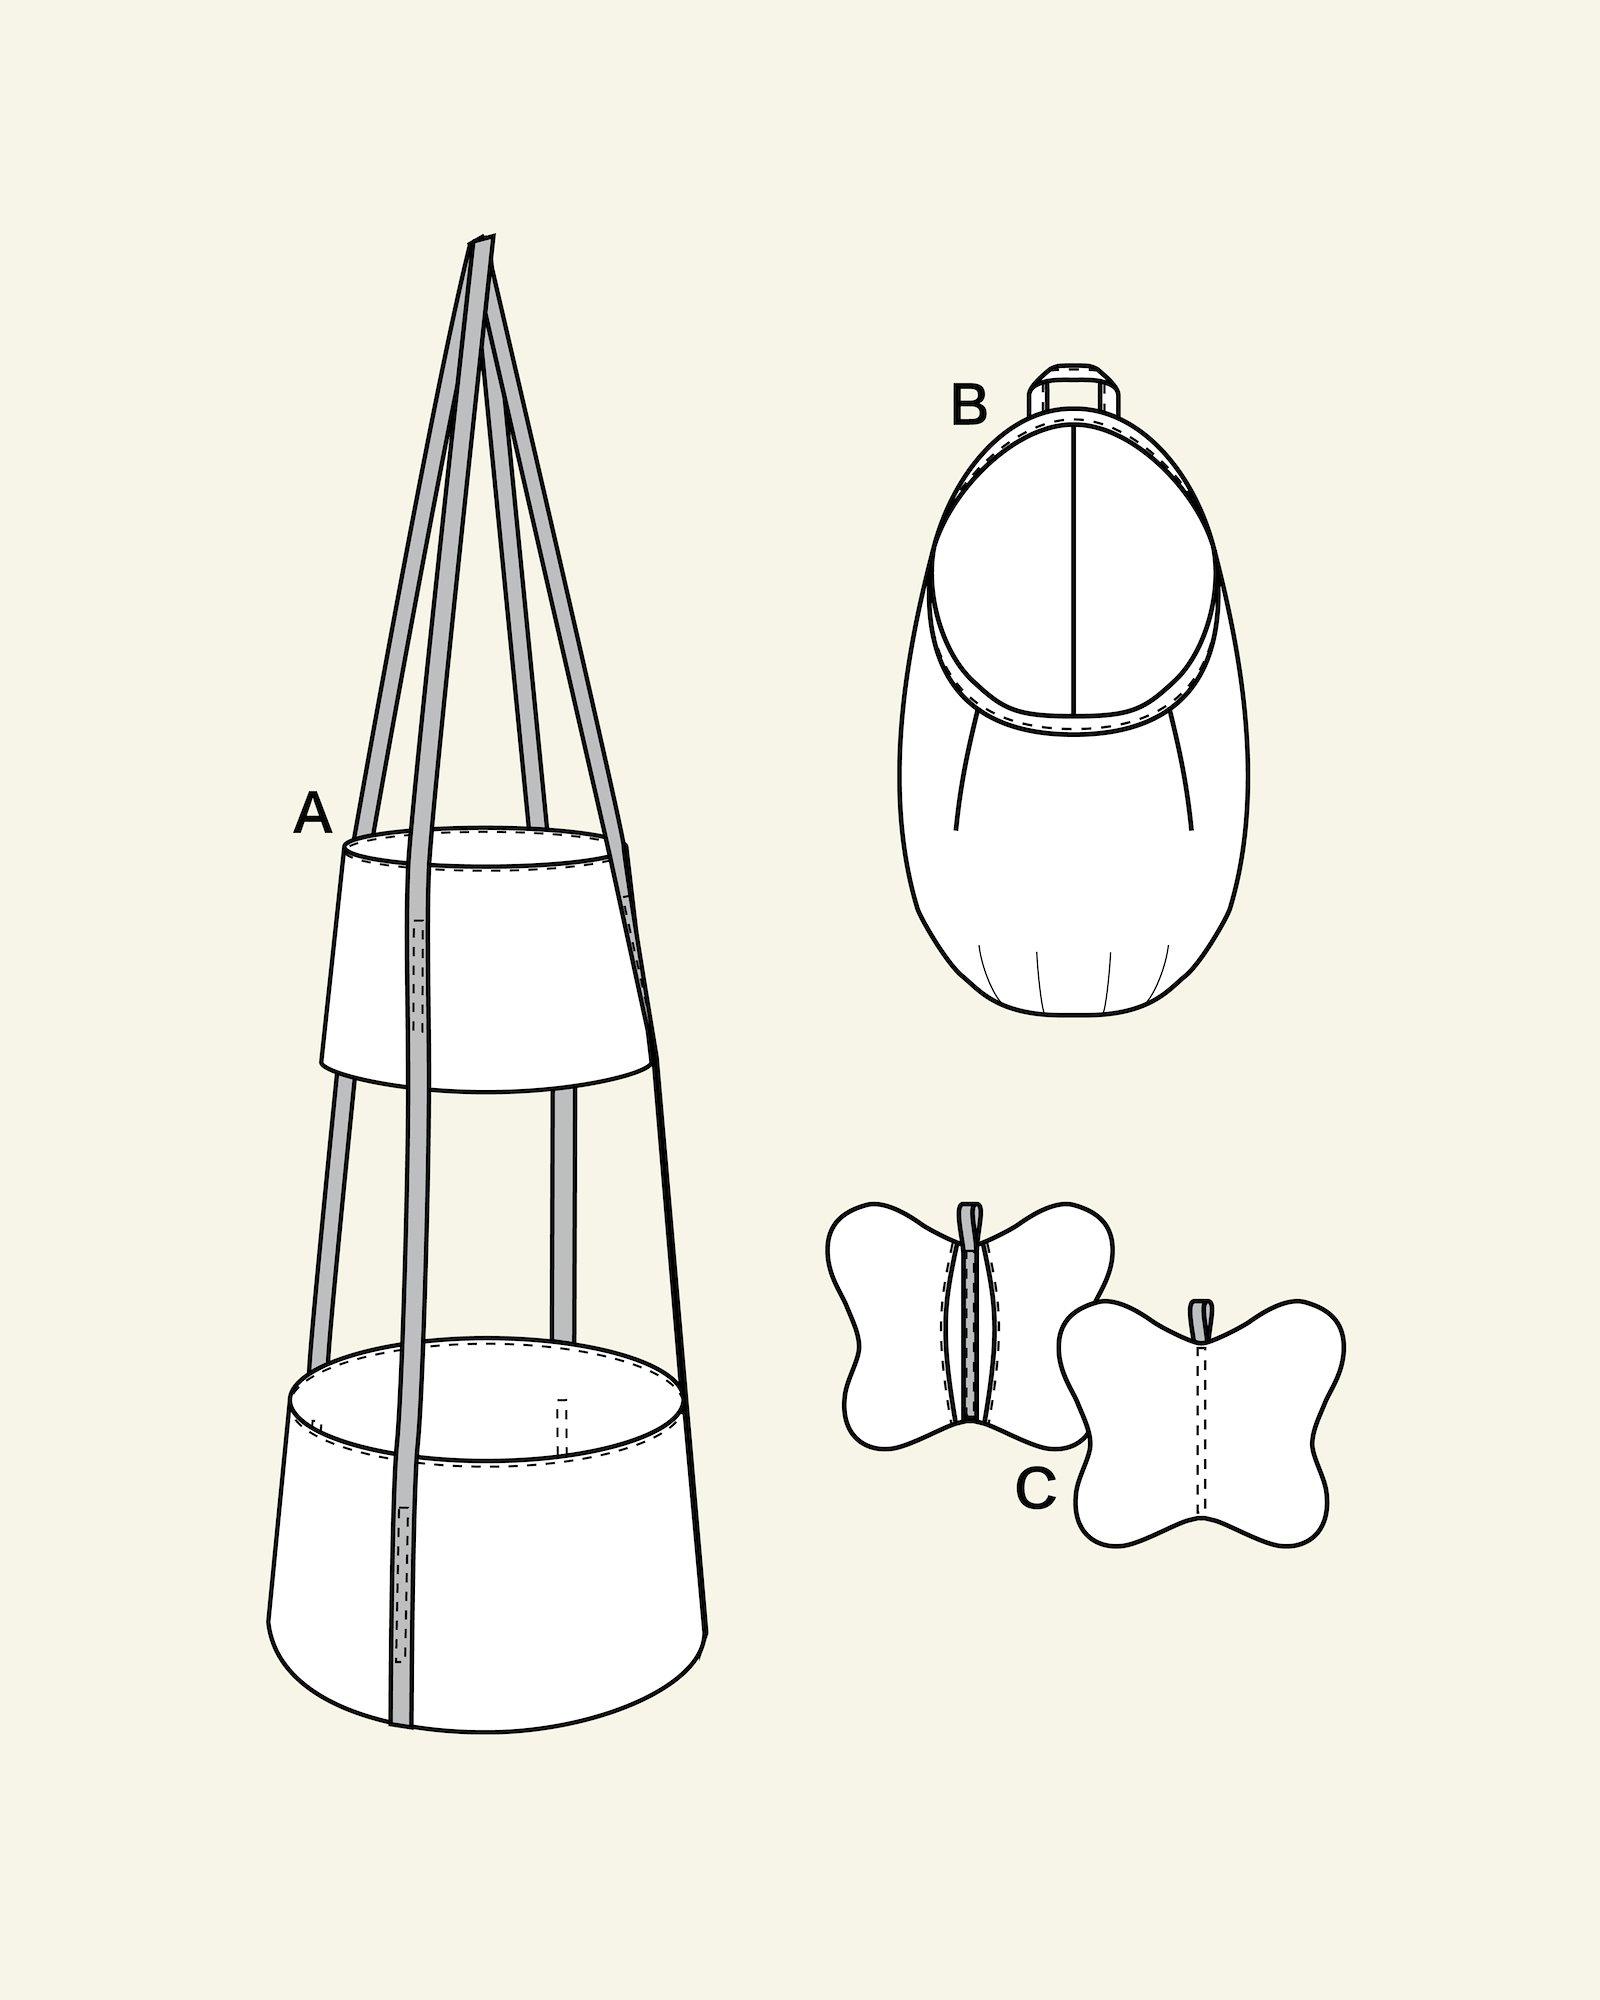 Hanging basket and pot holders